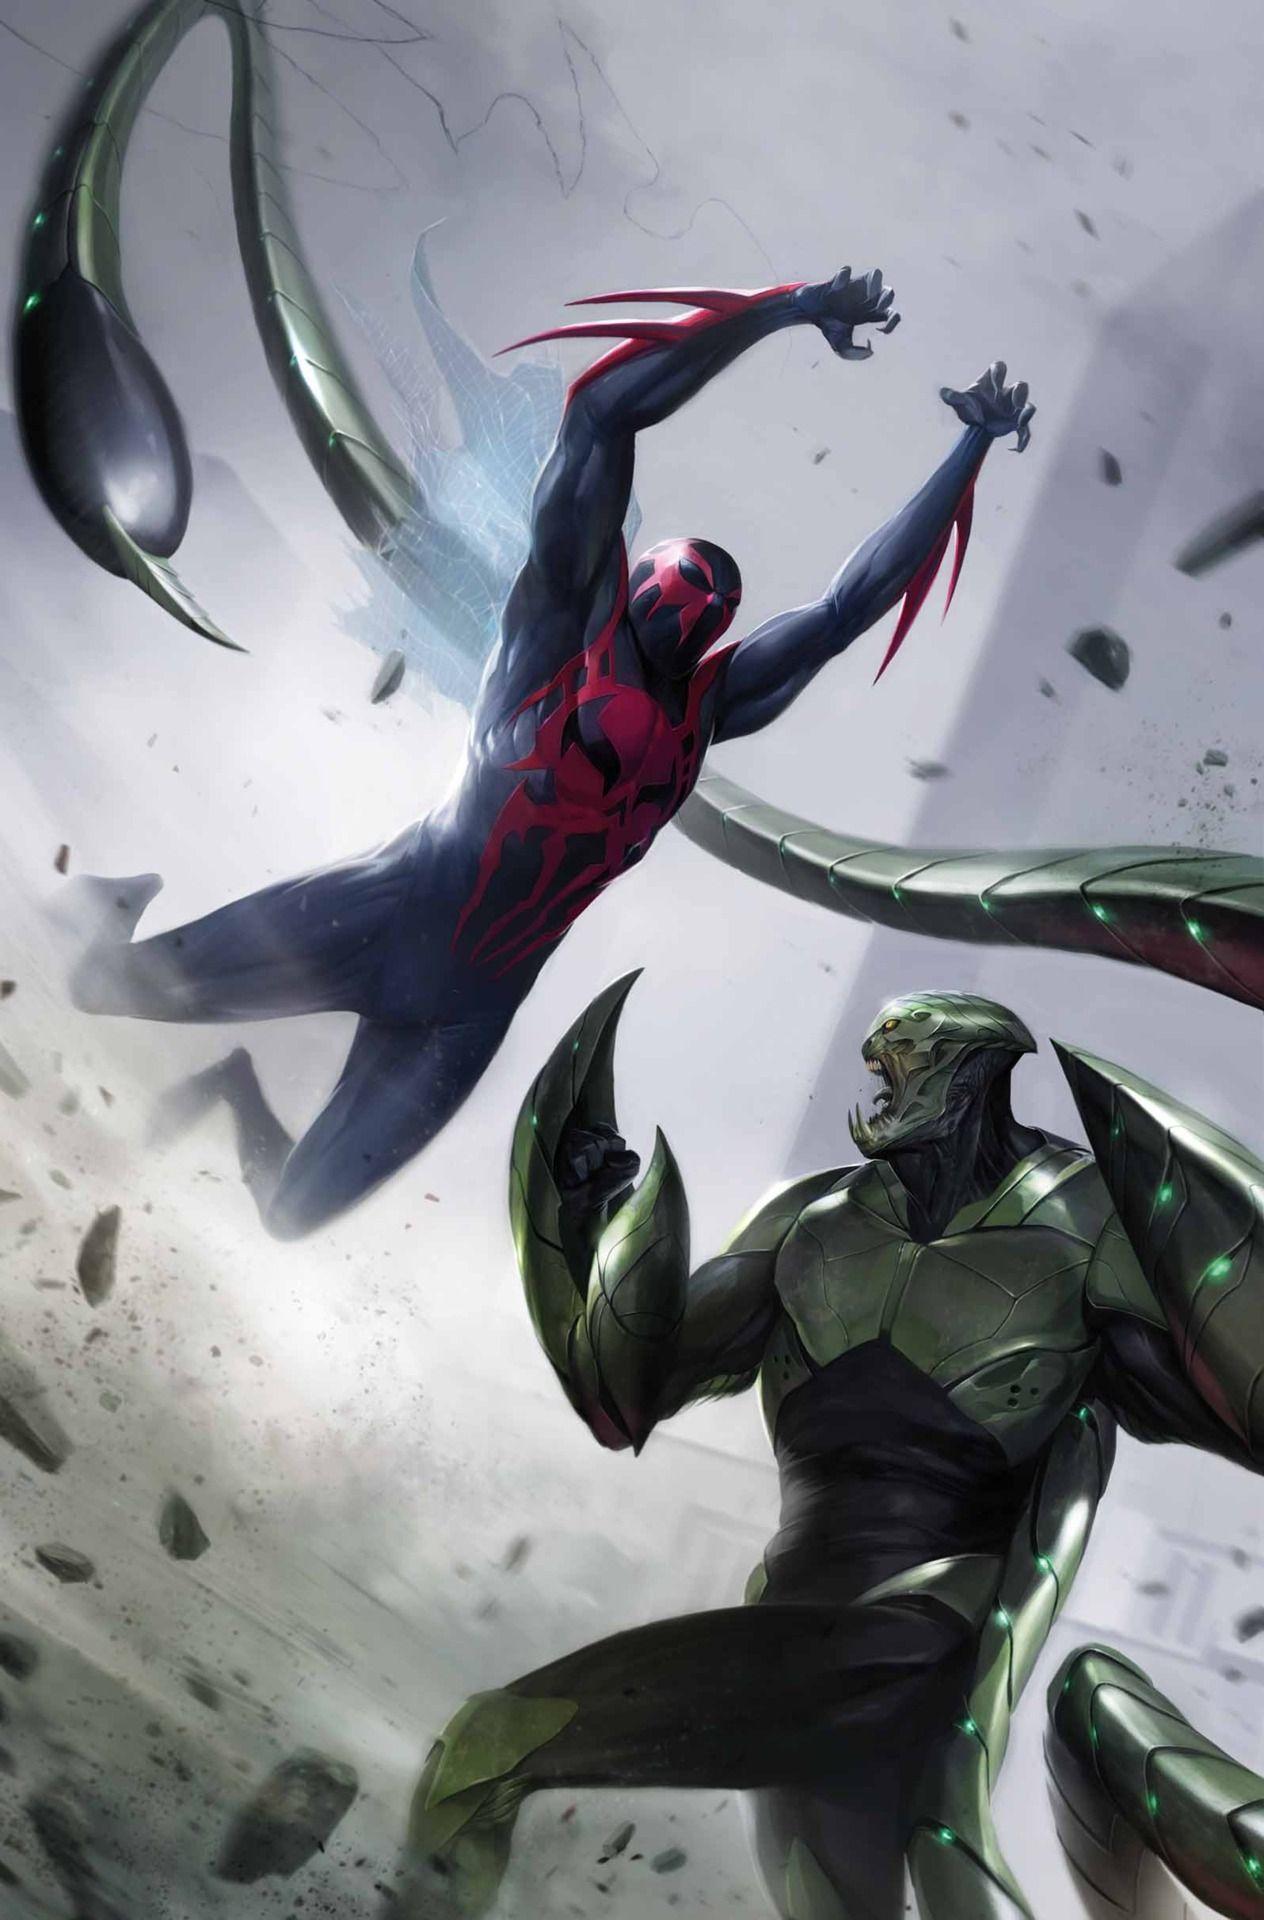 Spider-Man 2099 v Scorpion by Francesco Mattina! (Marvel comics)